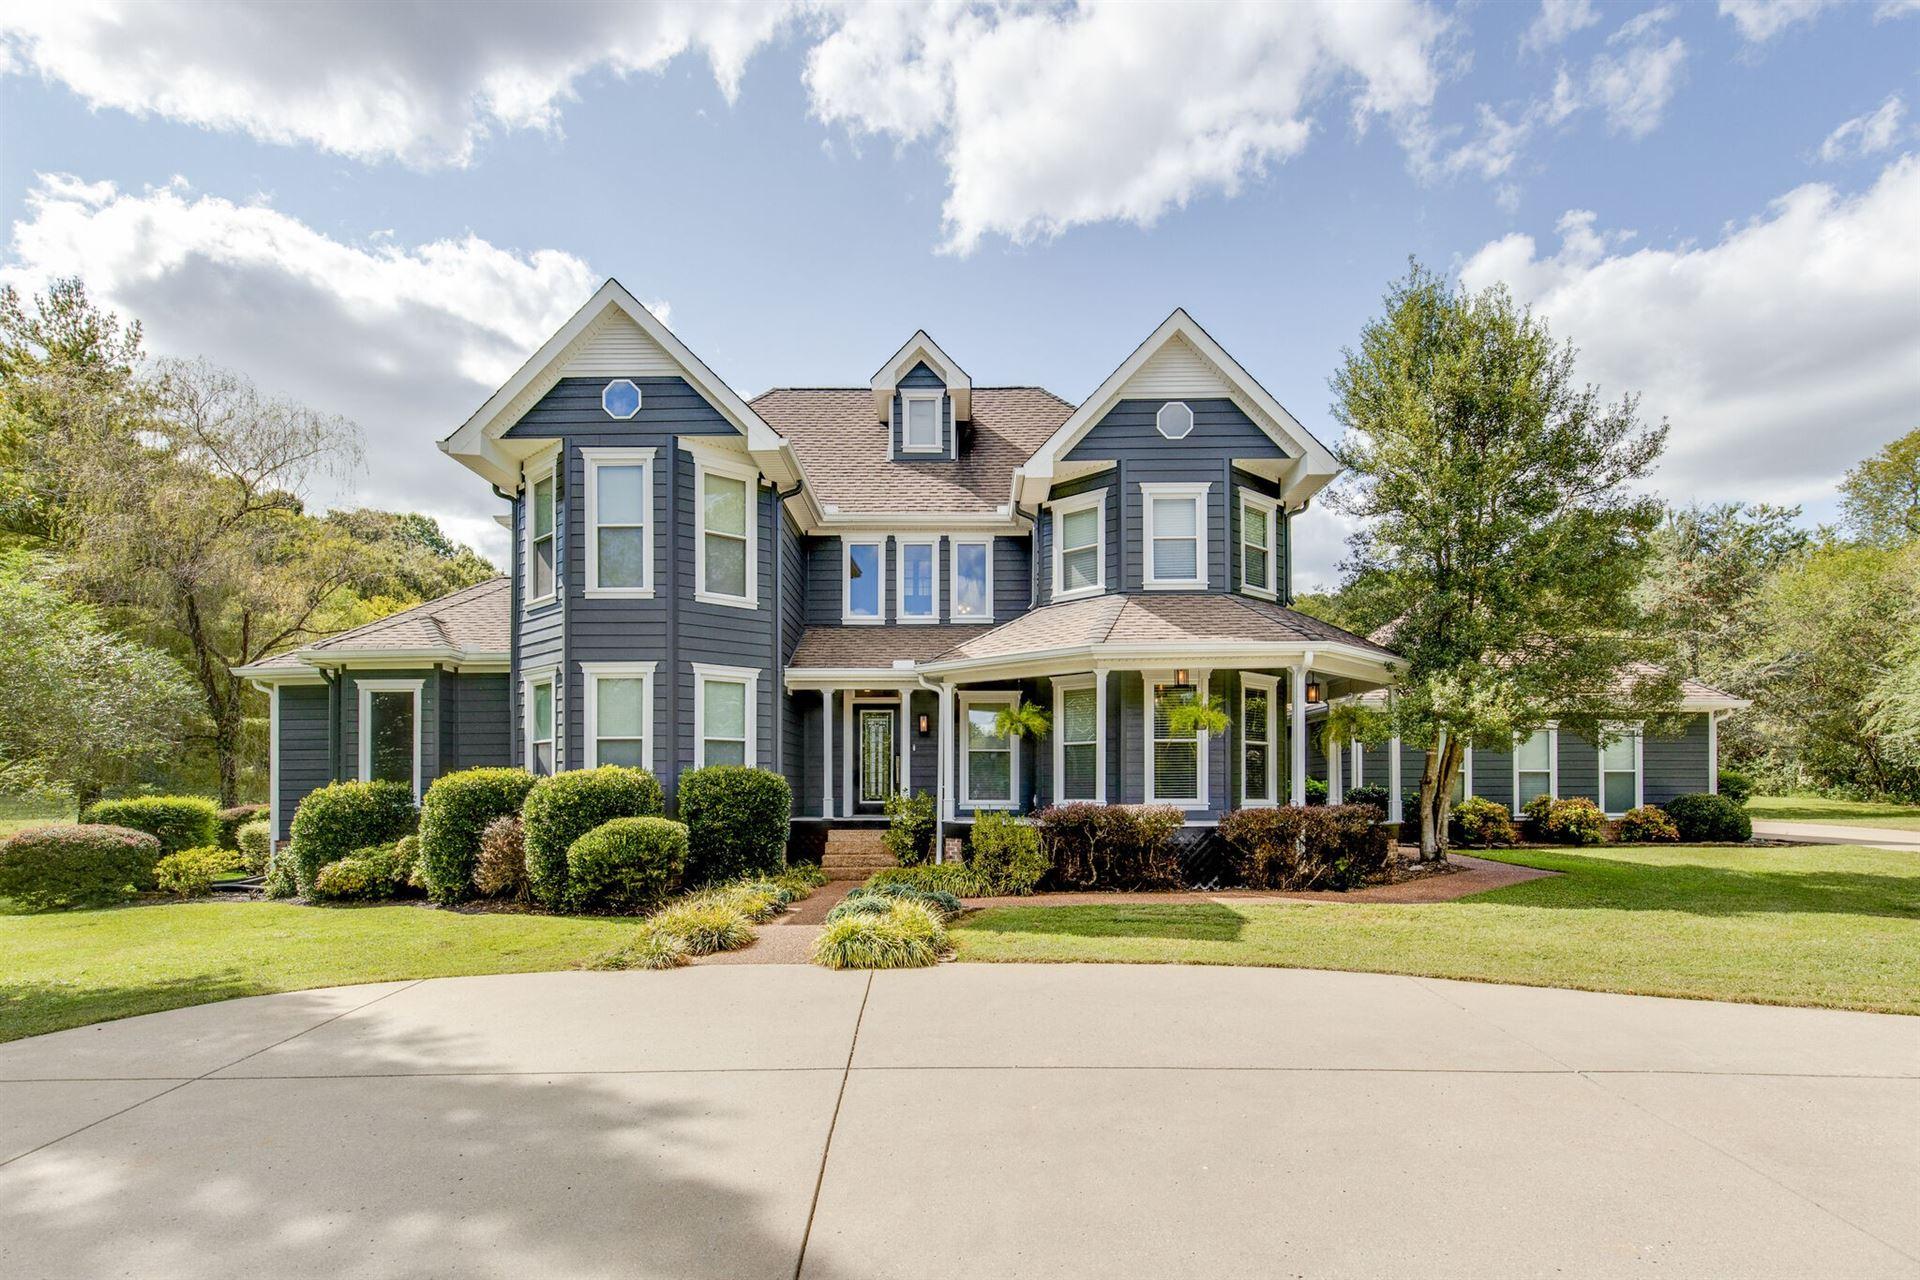 1683 ANDERSON RD, Hendersonville, TN 37075 - MLS#: 2195493